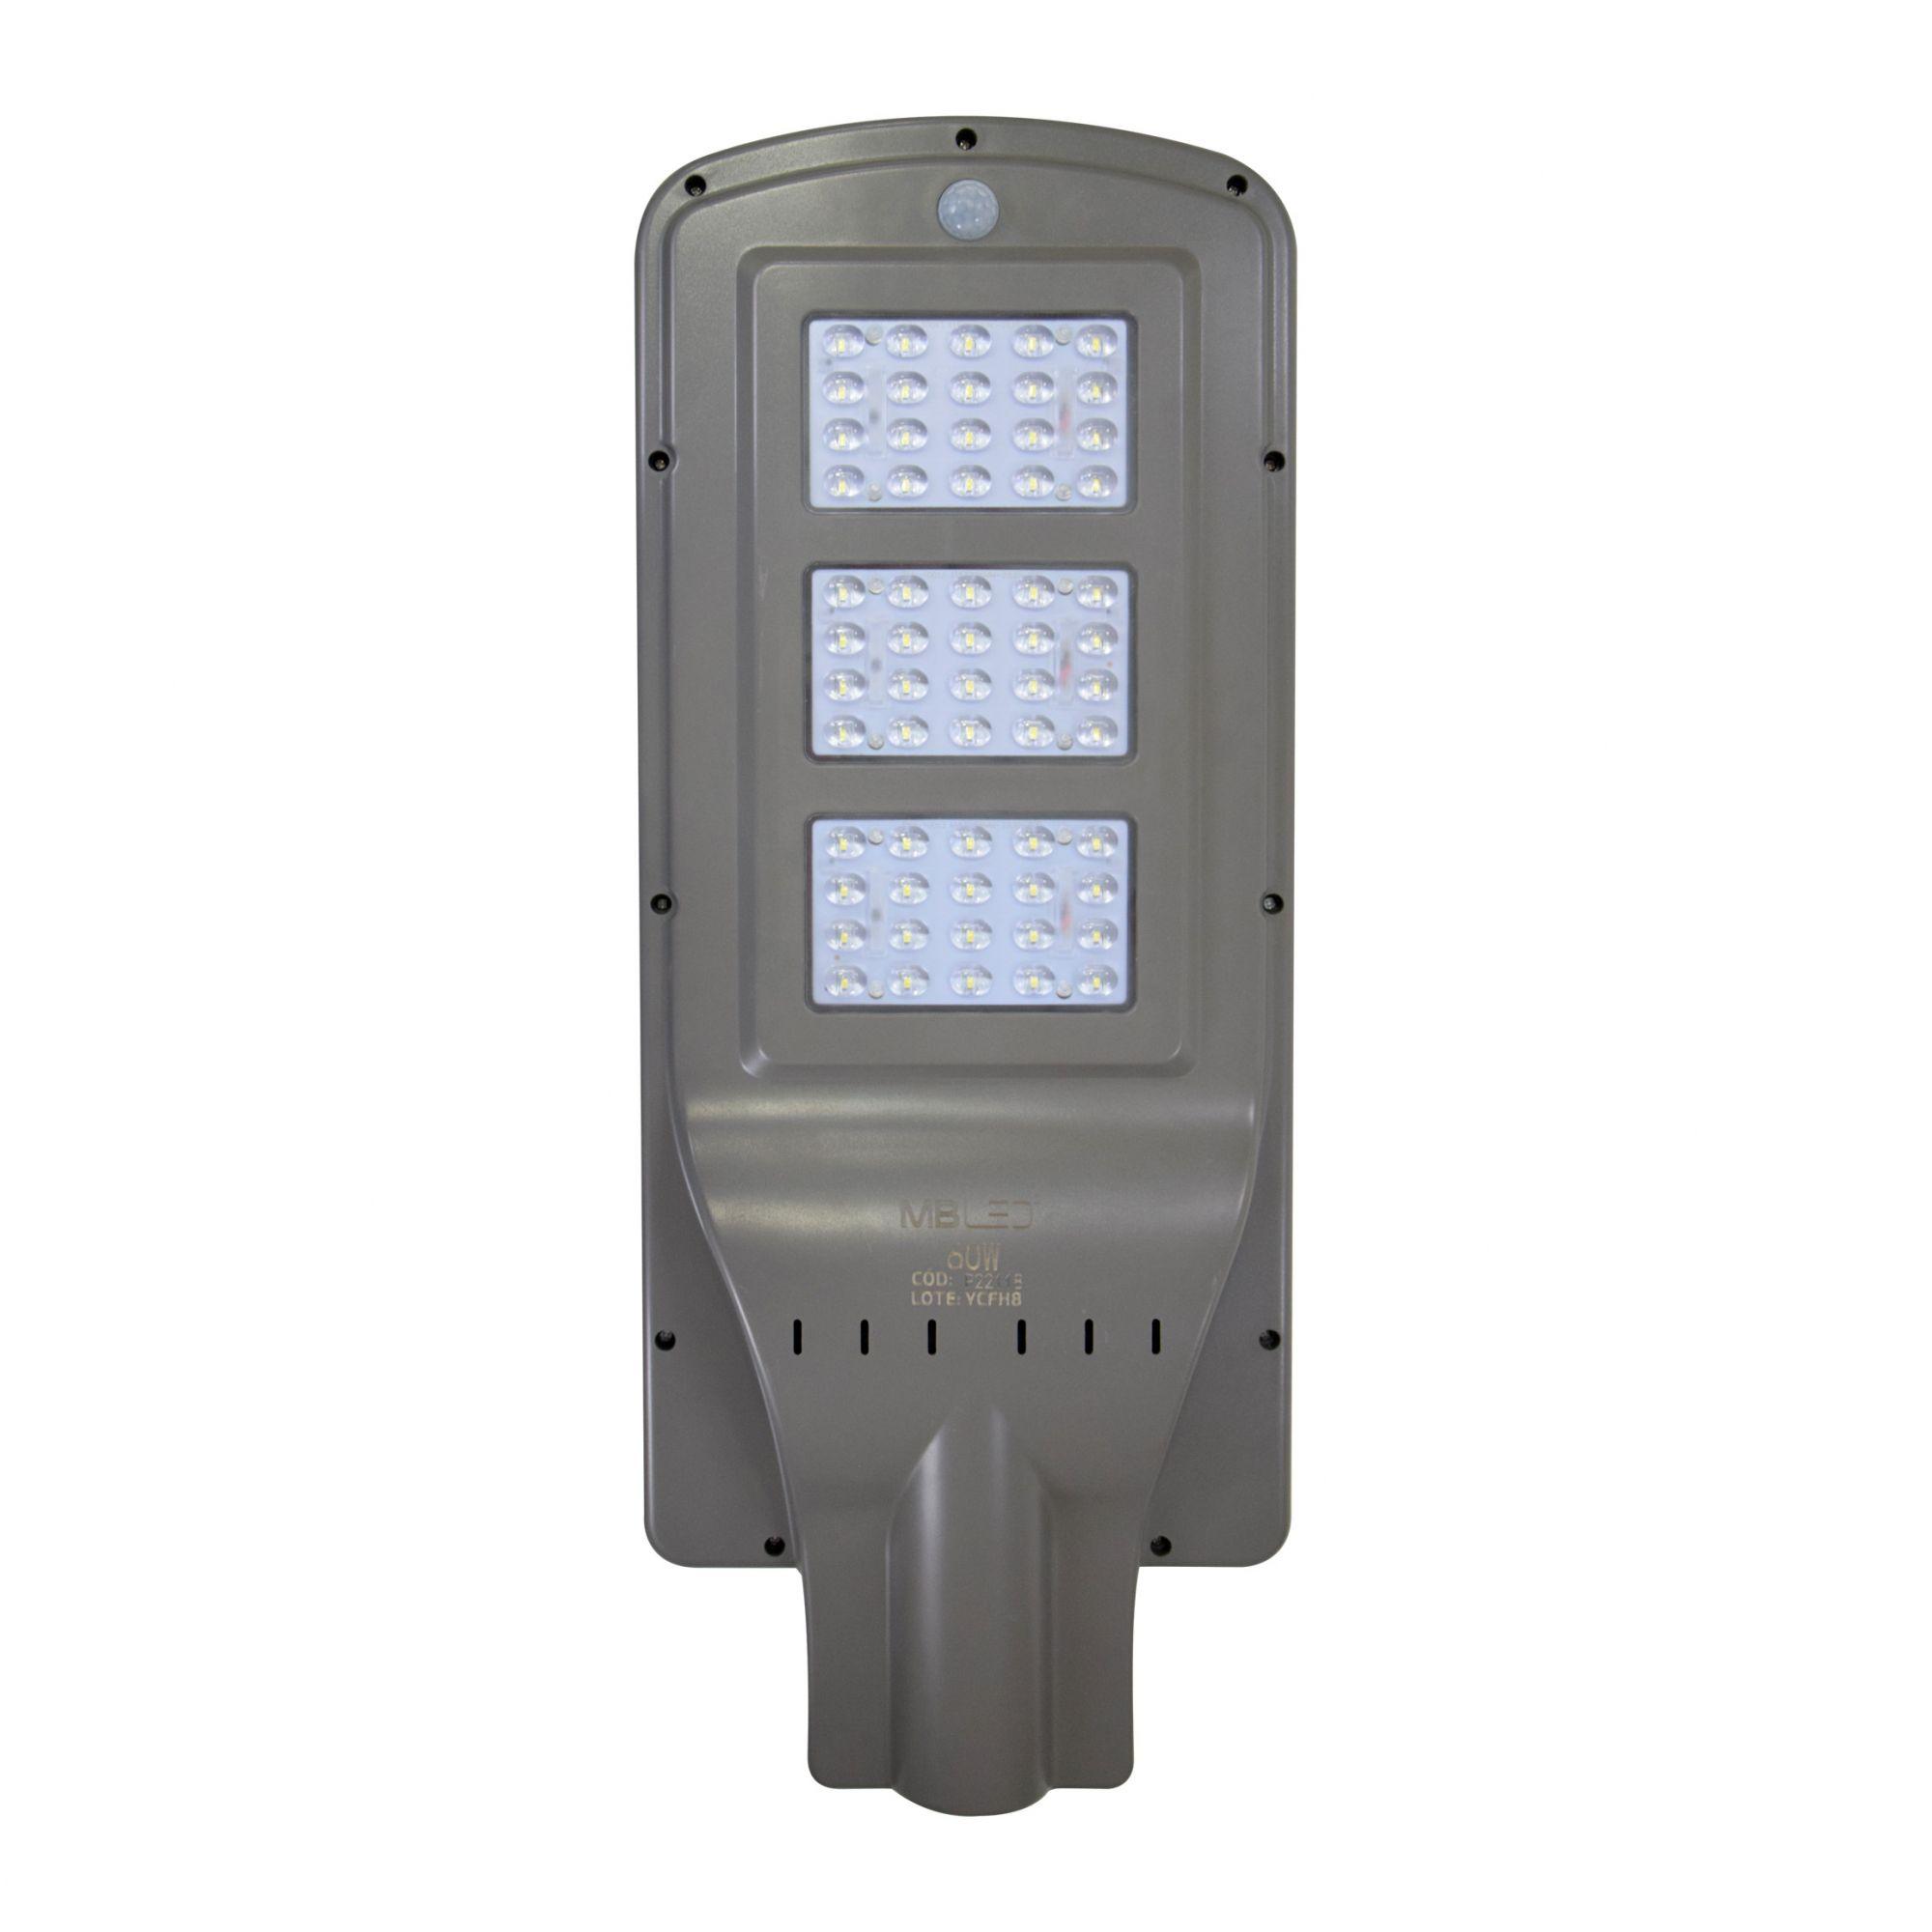 Luminária Pública LED Solar 60W 6500K p/ Poste - MB LED